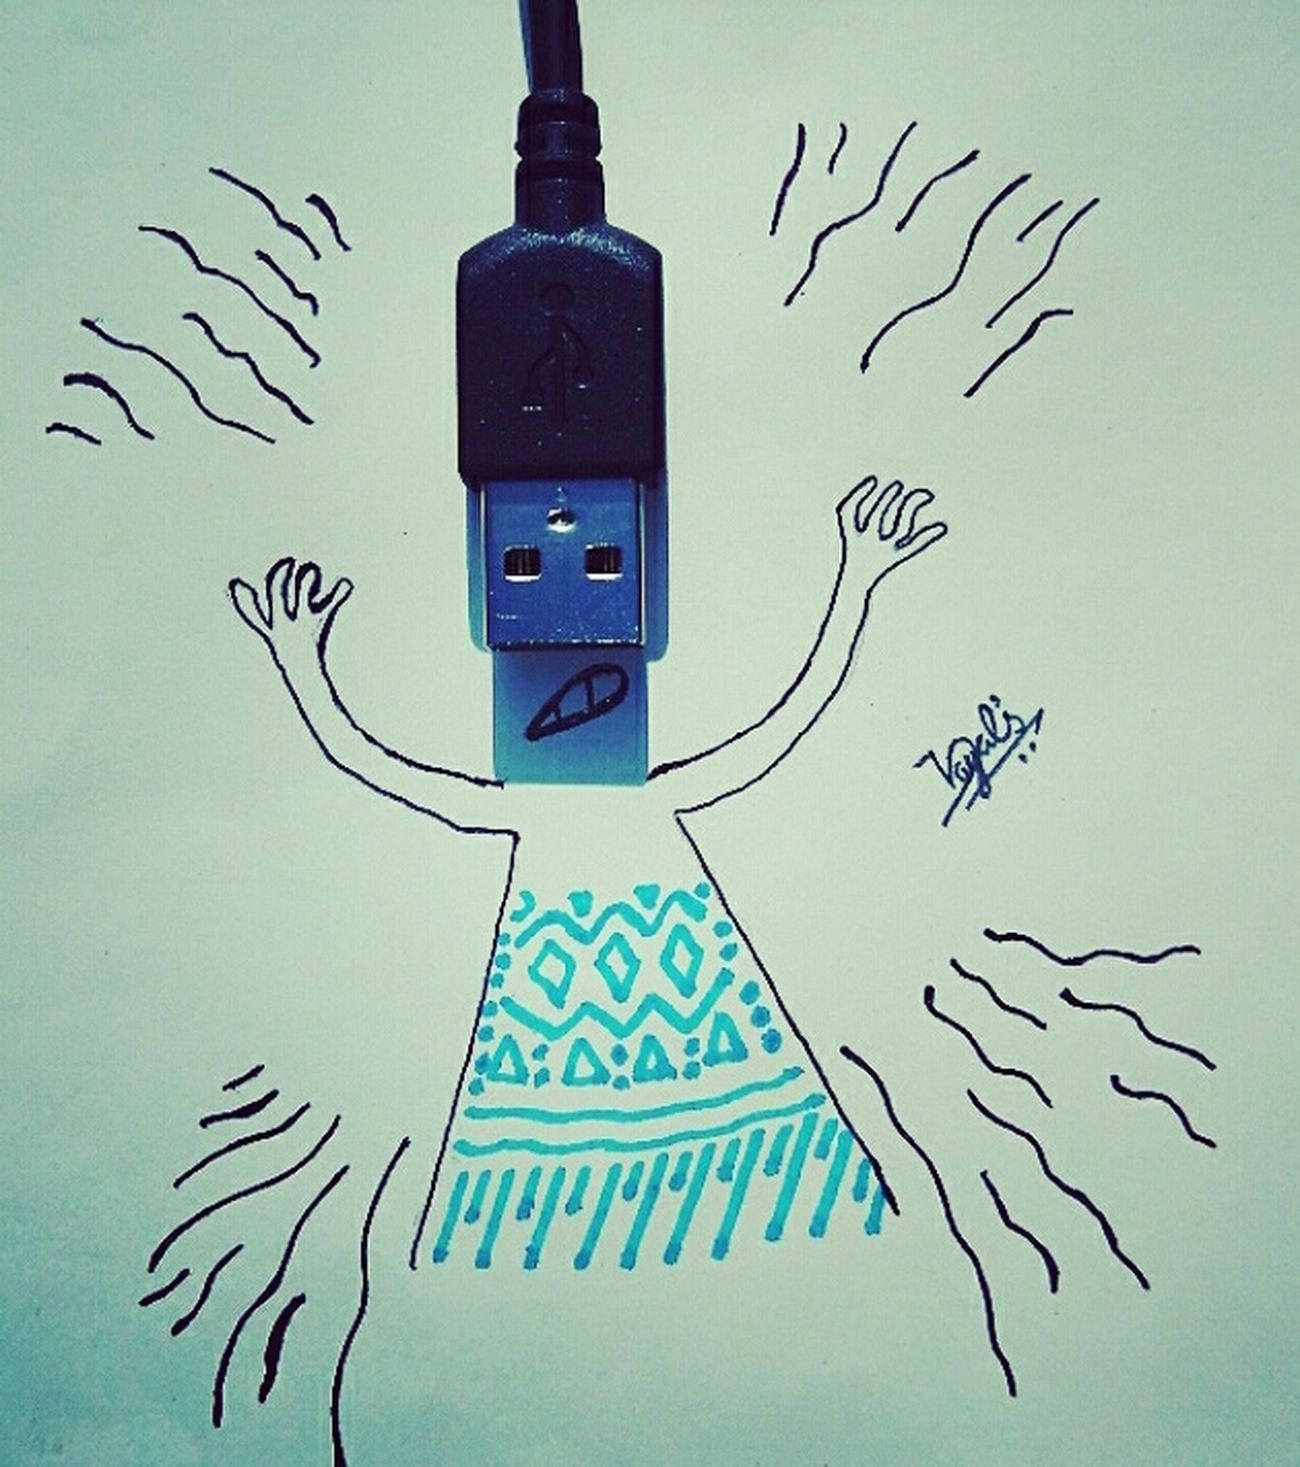 ☀⚡SHADOW ART-6 (Electric Shock)😱⚡ Art MyArt Myartwork Shadow Shadow-art Artworks ArtWork Creative Artoftheday Pencil Art Arts Art Gallery Draw Drawing Creative Shots Artist ArtInMyLife Arte Myartbook Creativity Artgallery Artsy Pencil Drawing Paper Artphoto